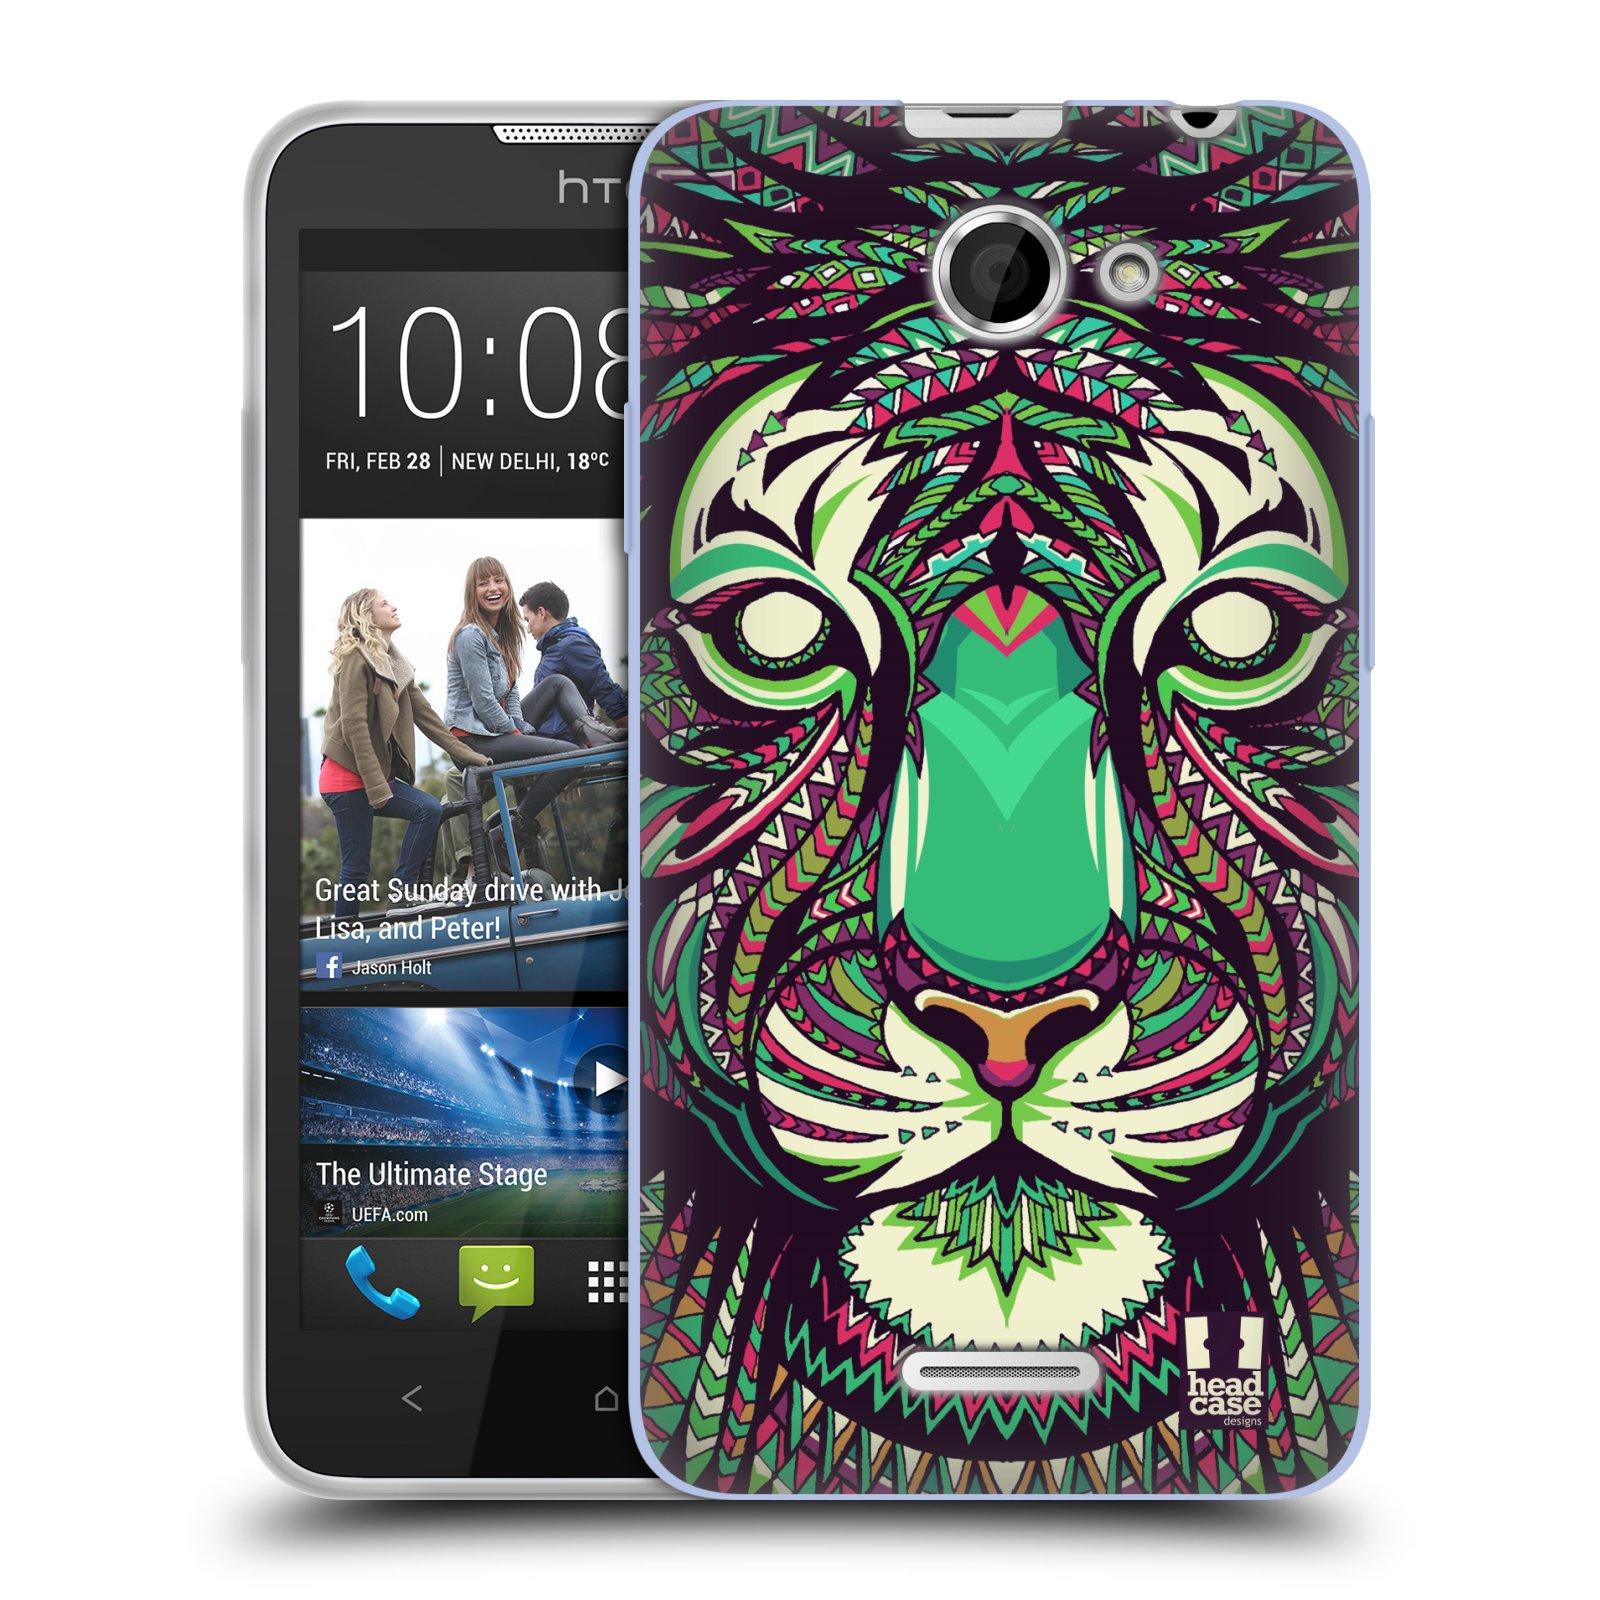 Silikonové pouzdro na mobil HTC Desire 516 HEAD CASE AZTEC TYGR (Silikonový kryt či obal na mobilní telefon HTC Desire 516 Dual SIM)